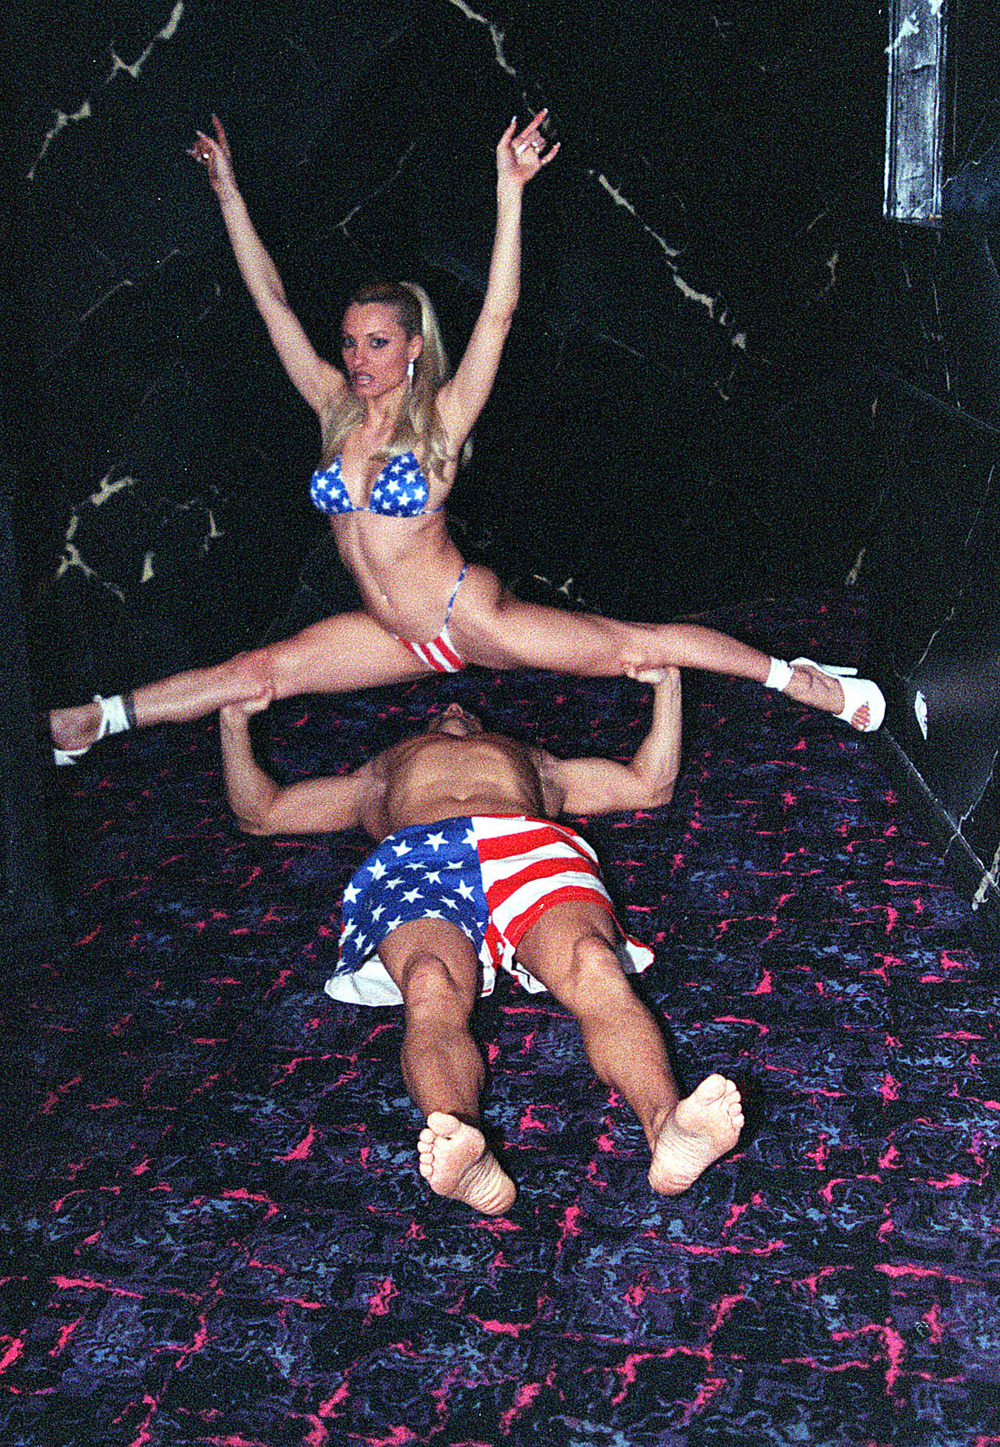 steve&emerald acrobatics 5x7.jpg